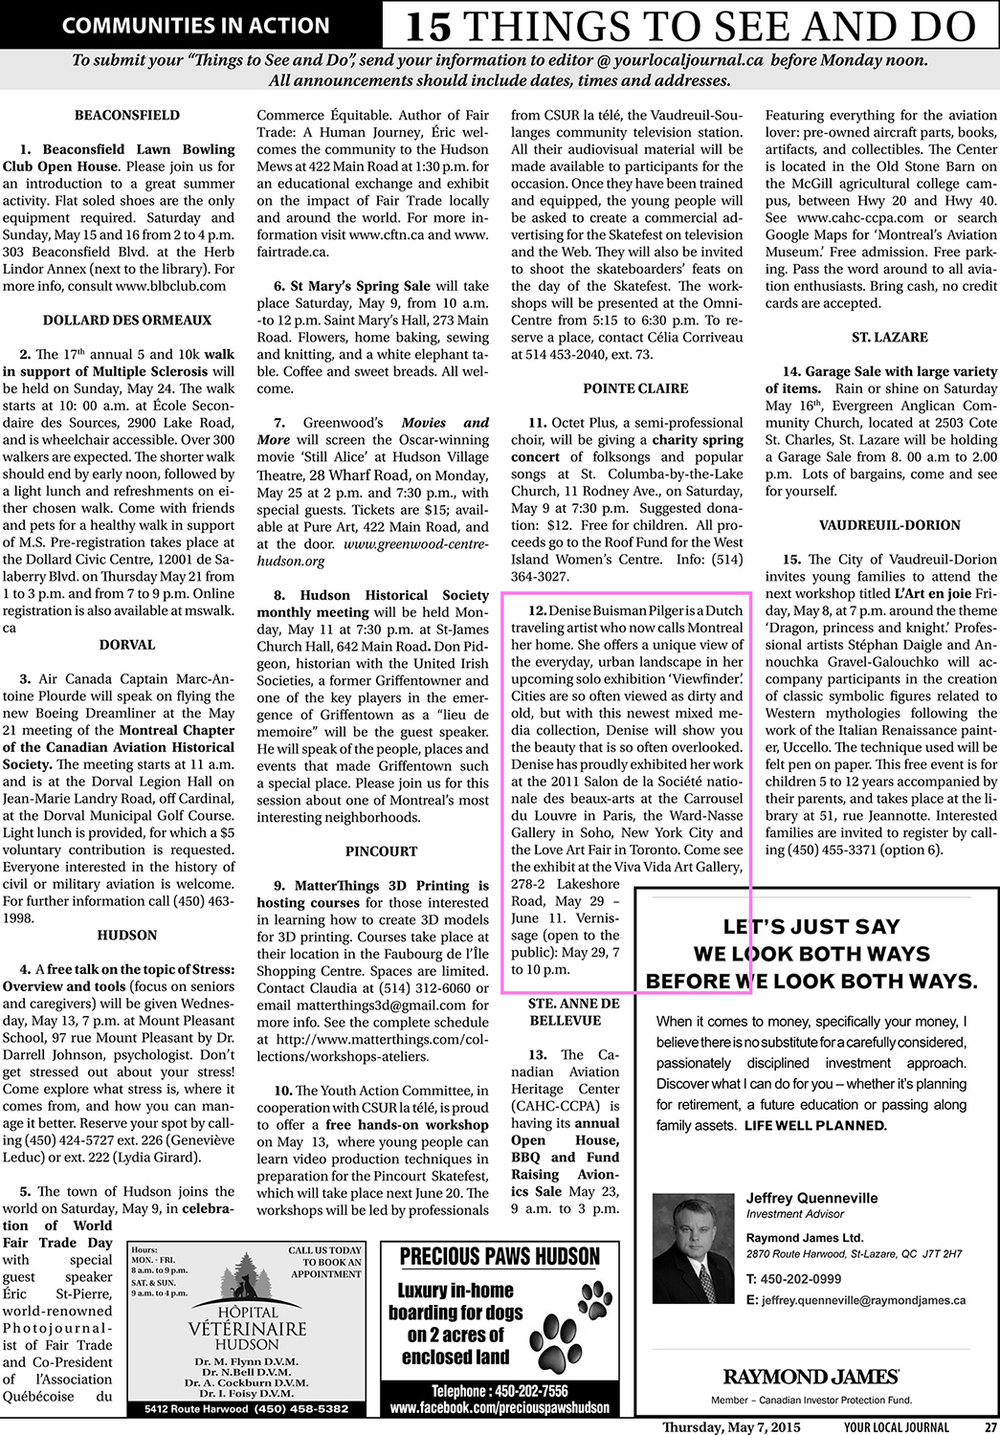 west-island-journal-may7-2015.jpg